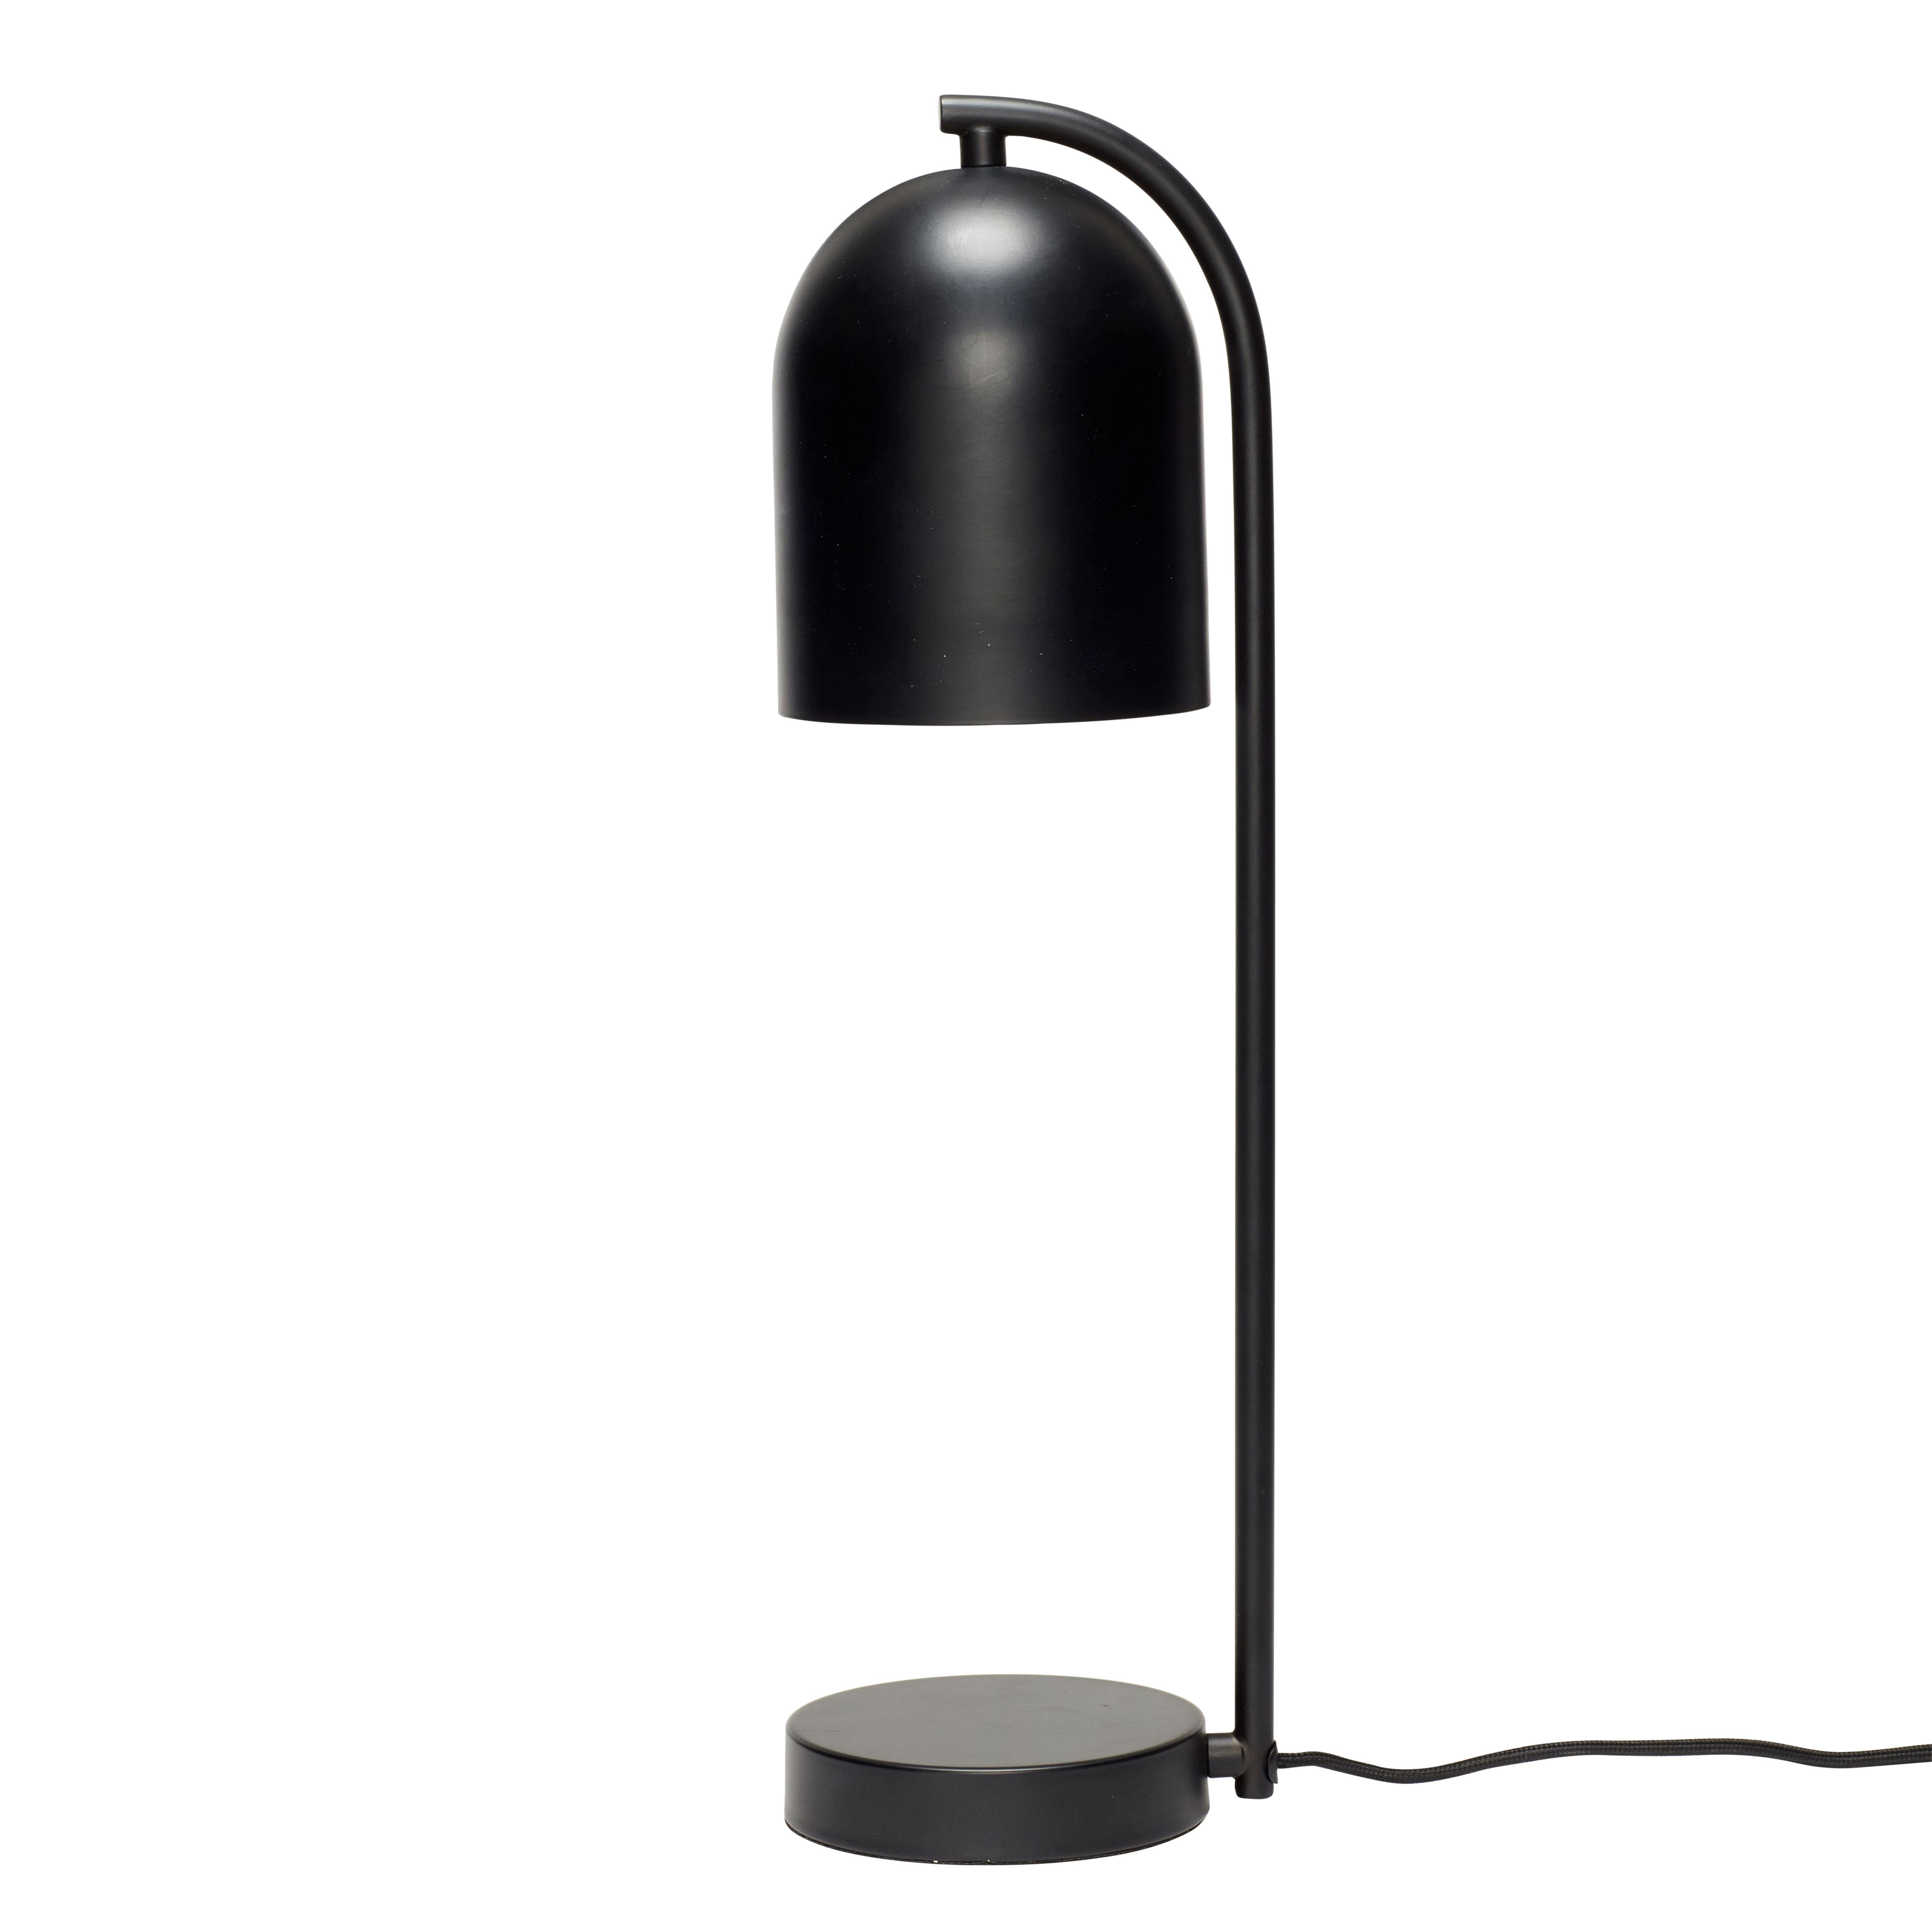 Cool Black Table Lamp. Simple Design. Item Number 890551   Designed By  Hübsch